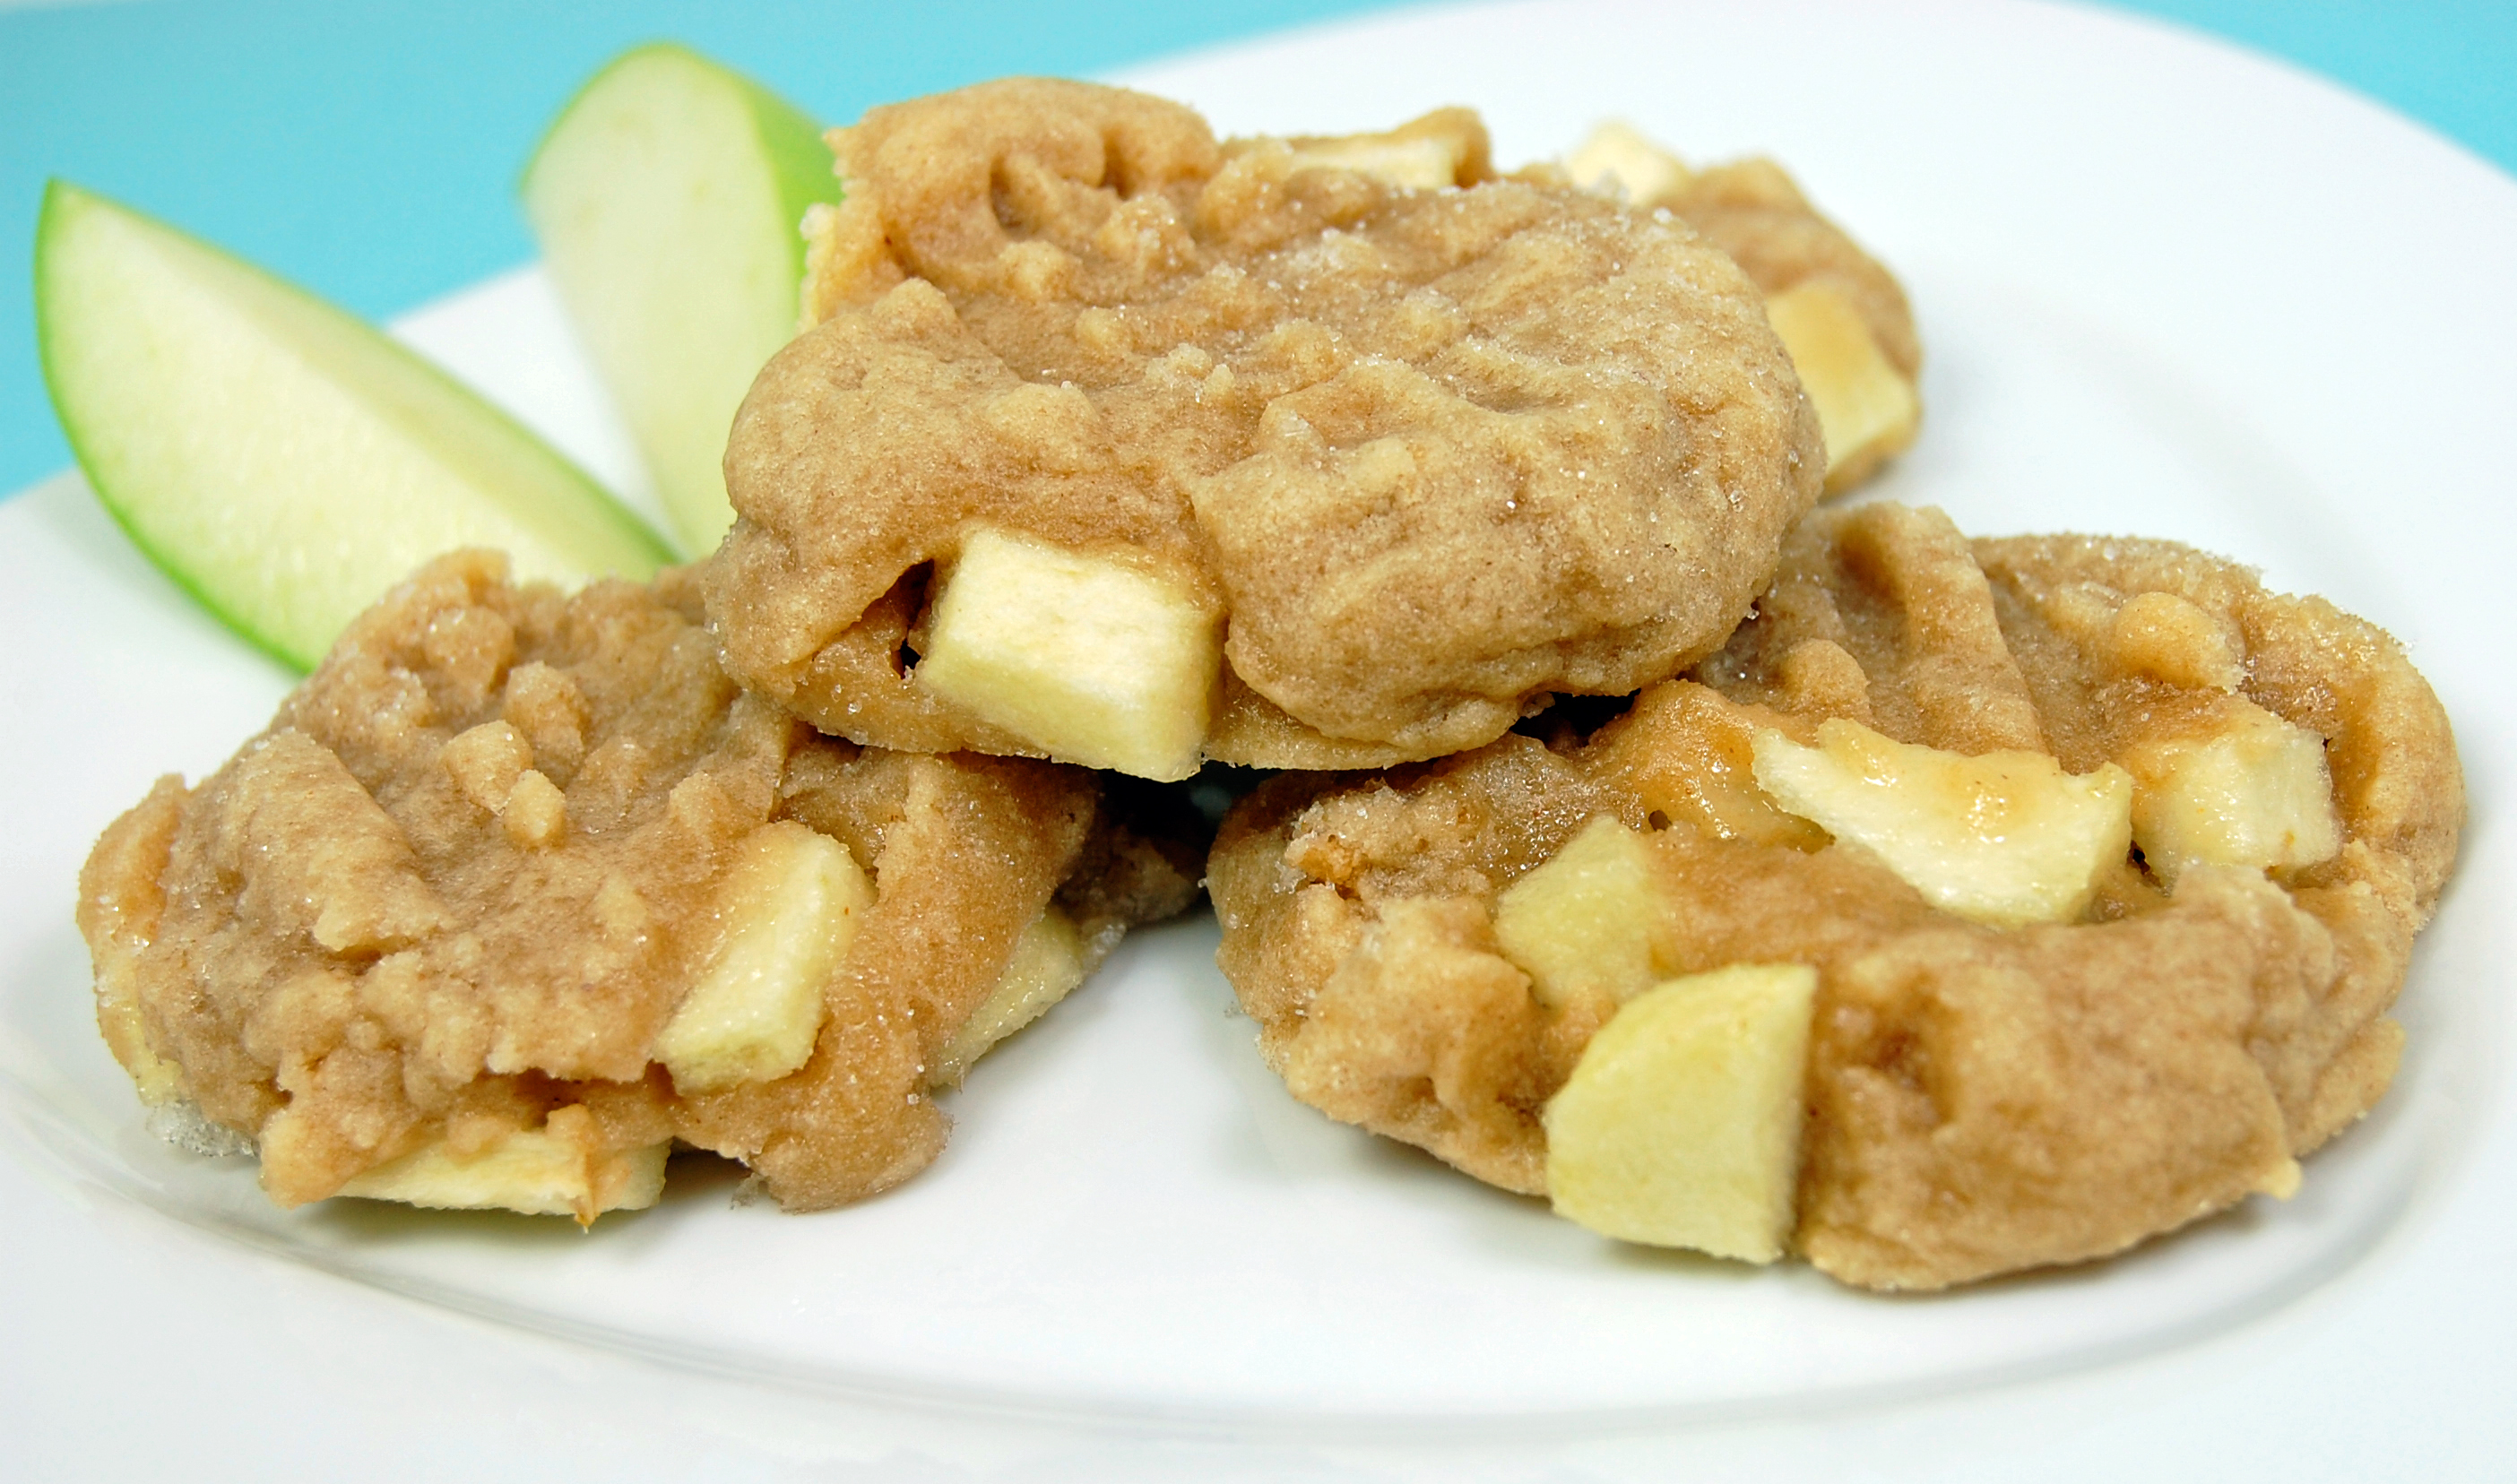 Apple Pickin' Peanut Butter Cookies